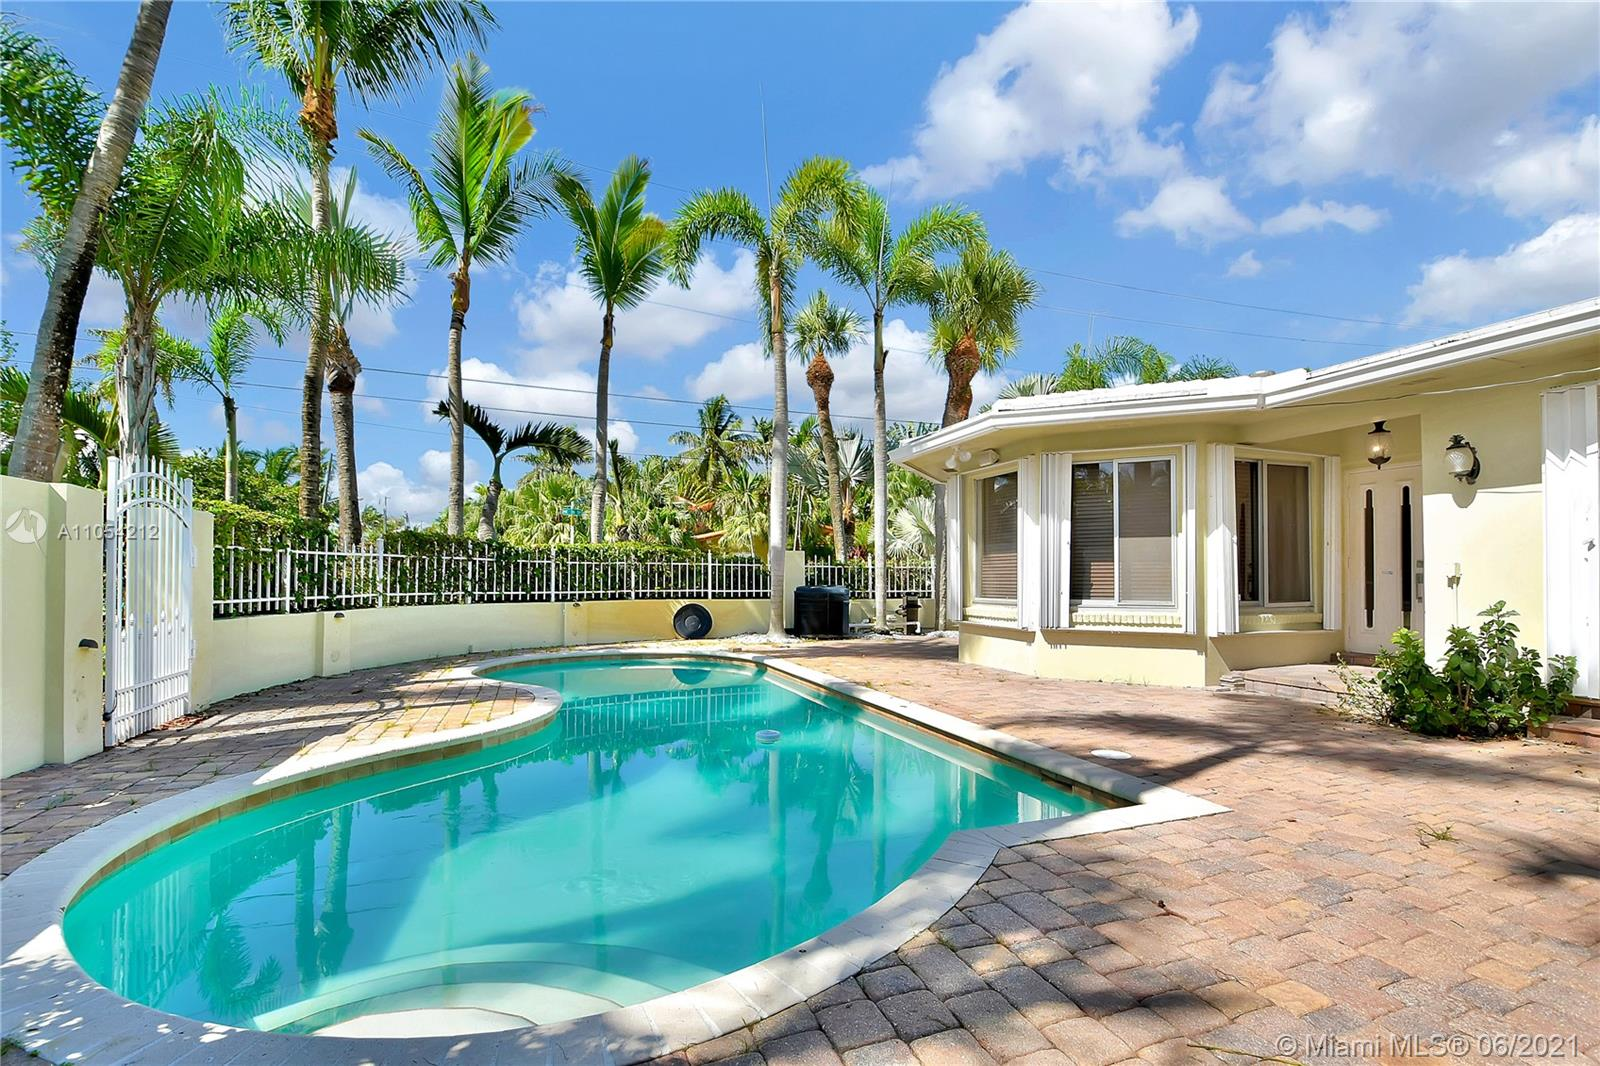 Lauderdale Beach - 3001 N Atlantic Blvd, Fort Lauderdale, FL 33308